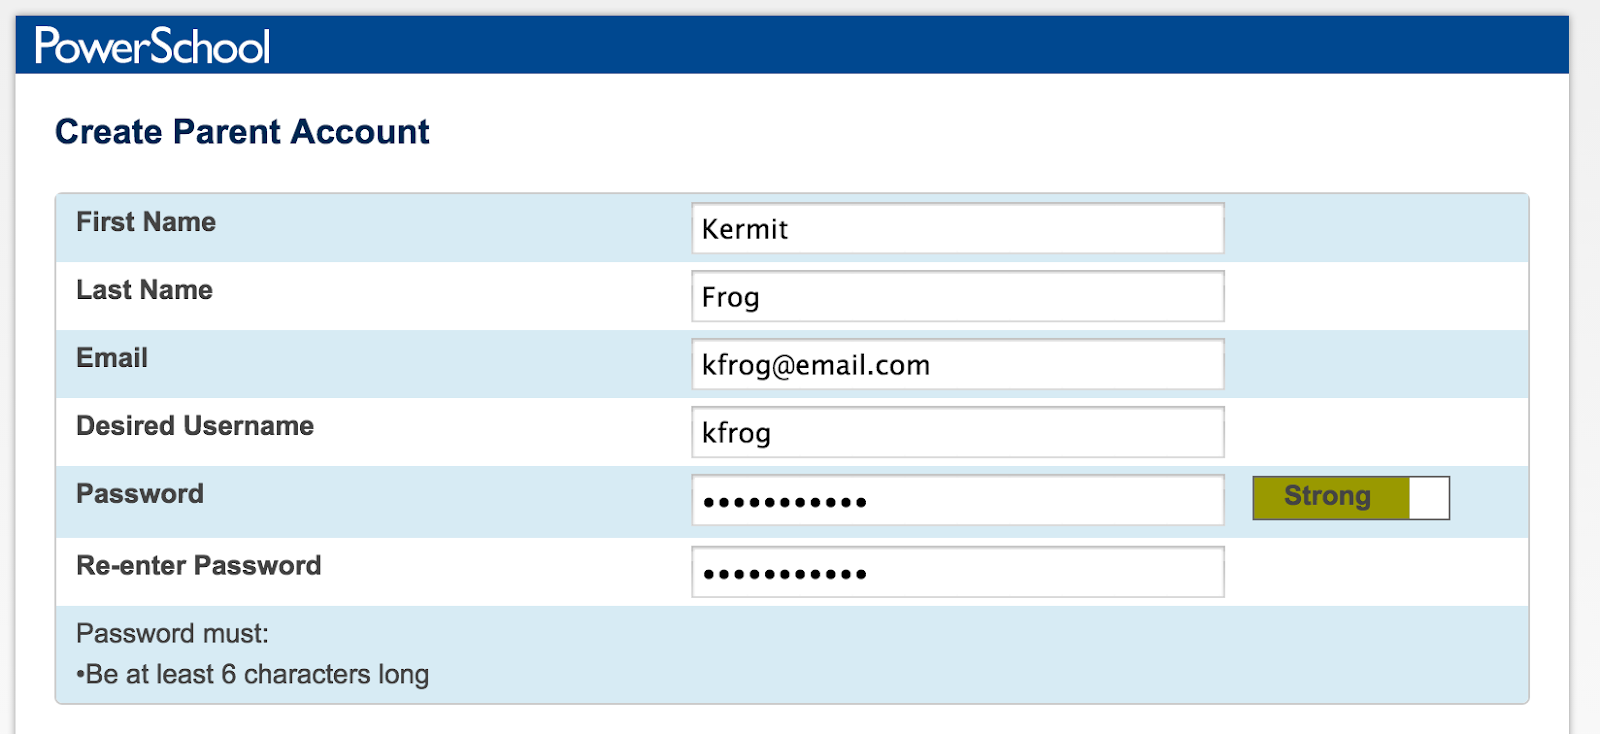 Macintosh HD:Users:burnell:Desktop:Screenshots:Screen Shot 2014-10-17 at 7.40.55 AM.png